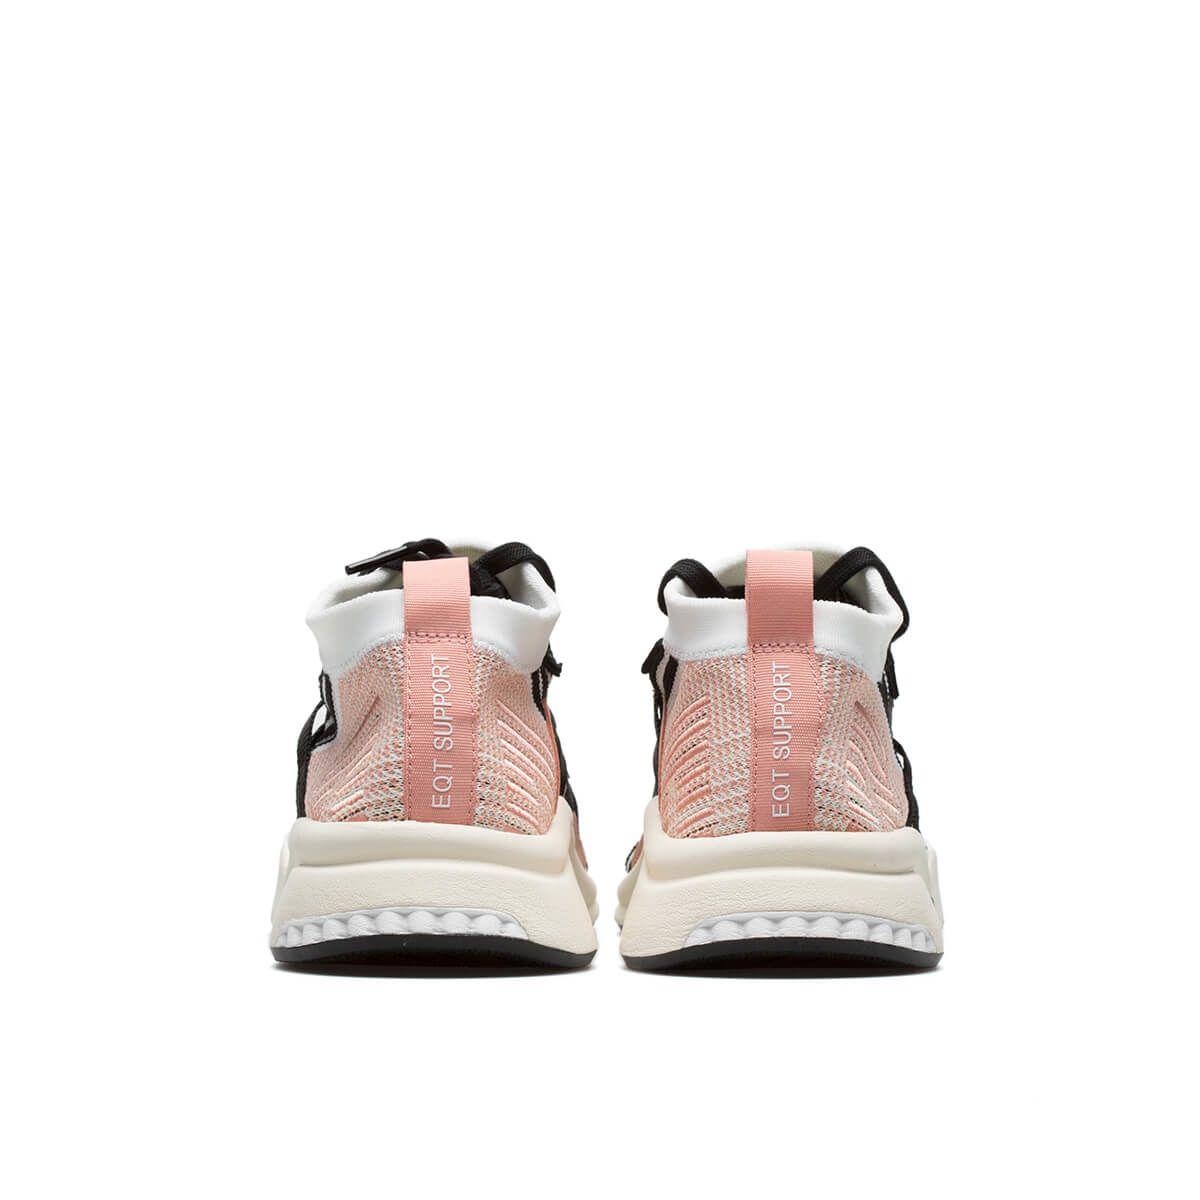 new styles c6aea ad75a ... Adidas Originals Eqt Support Mid Adv Pk - Multicolor